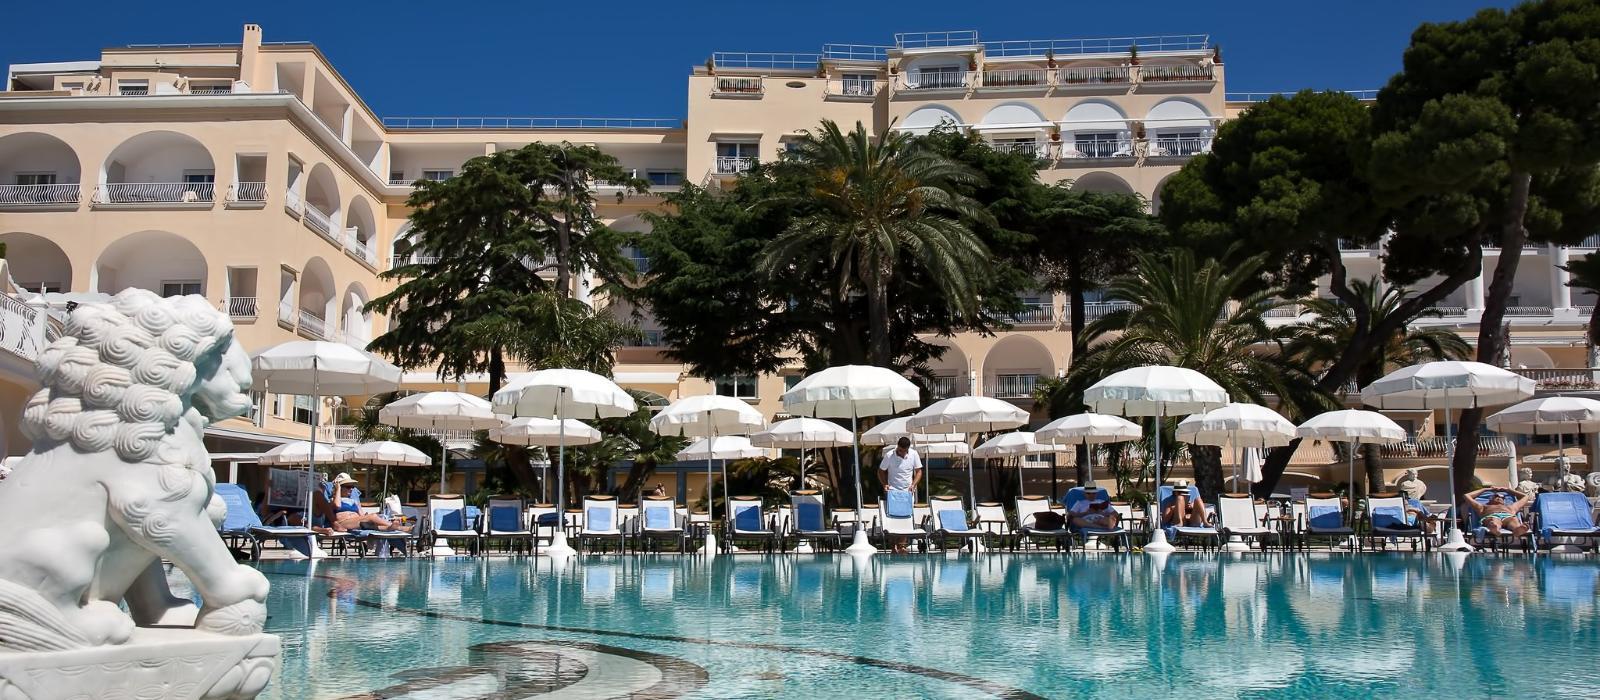 瑰诗诺度假酒店(Grand Hotel Quisisana) 图片  www.lhw.cn